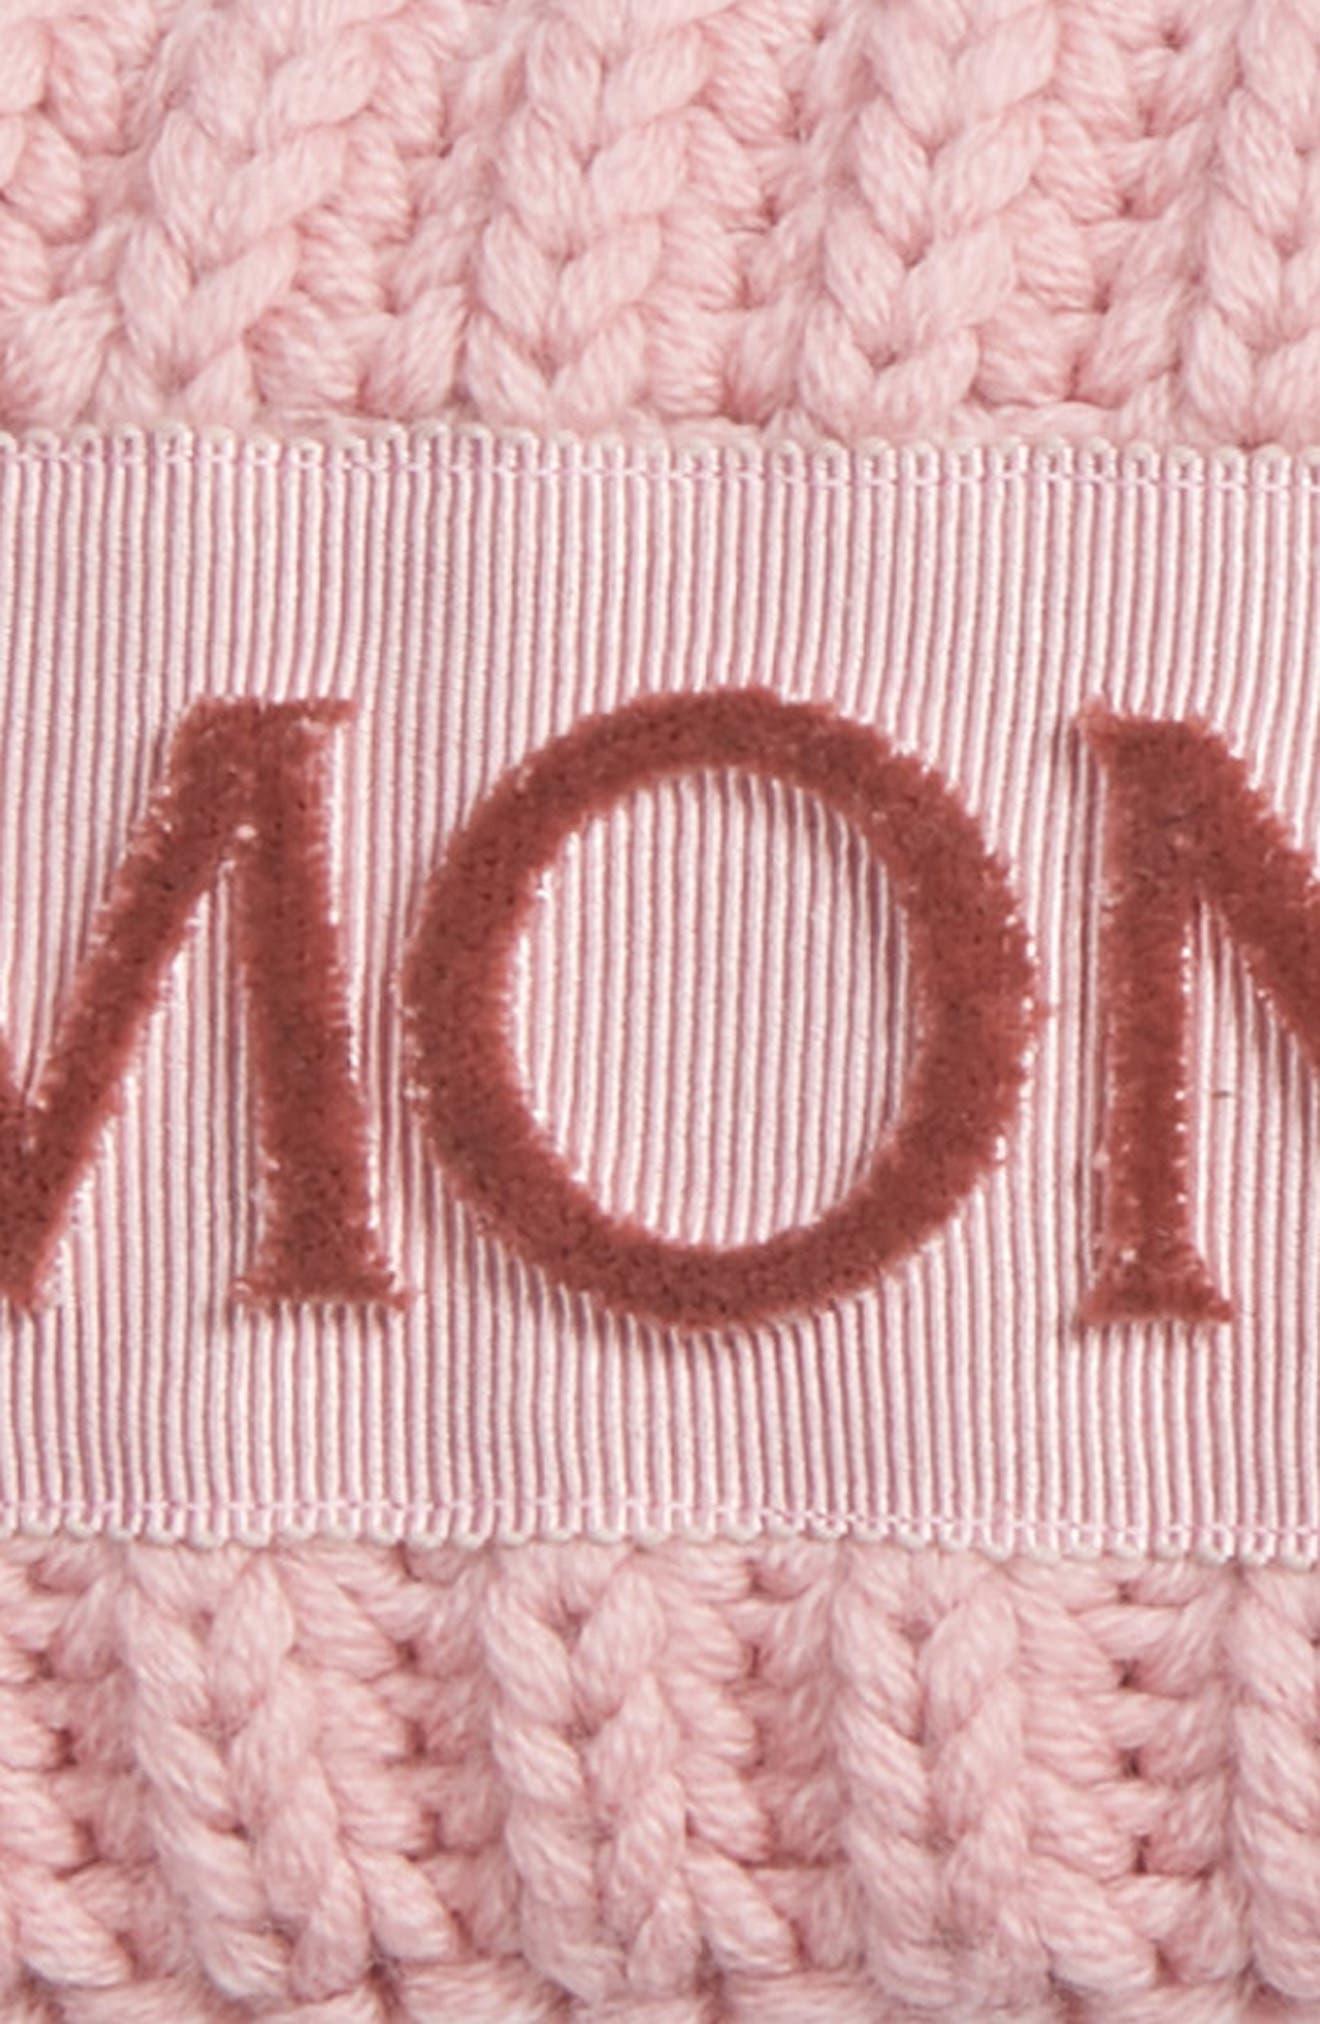 MONCLER, Rib Knit Headband, Alternate thumbnail 2, color, 662